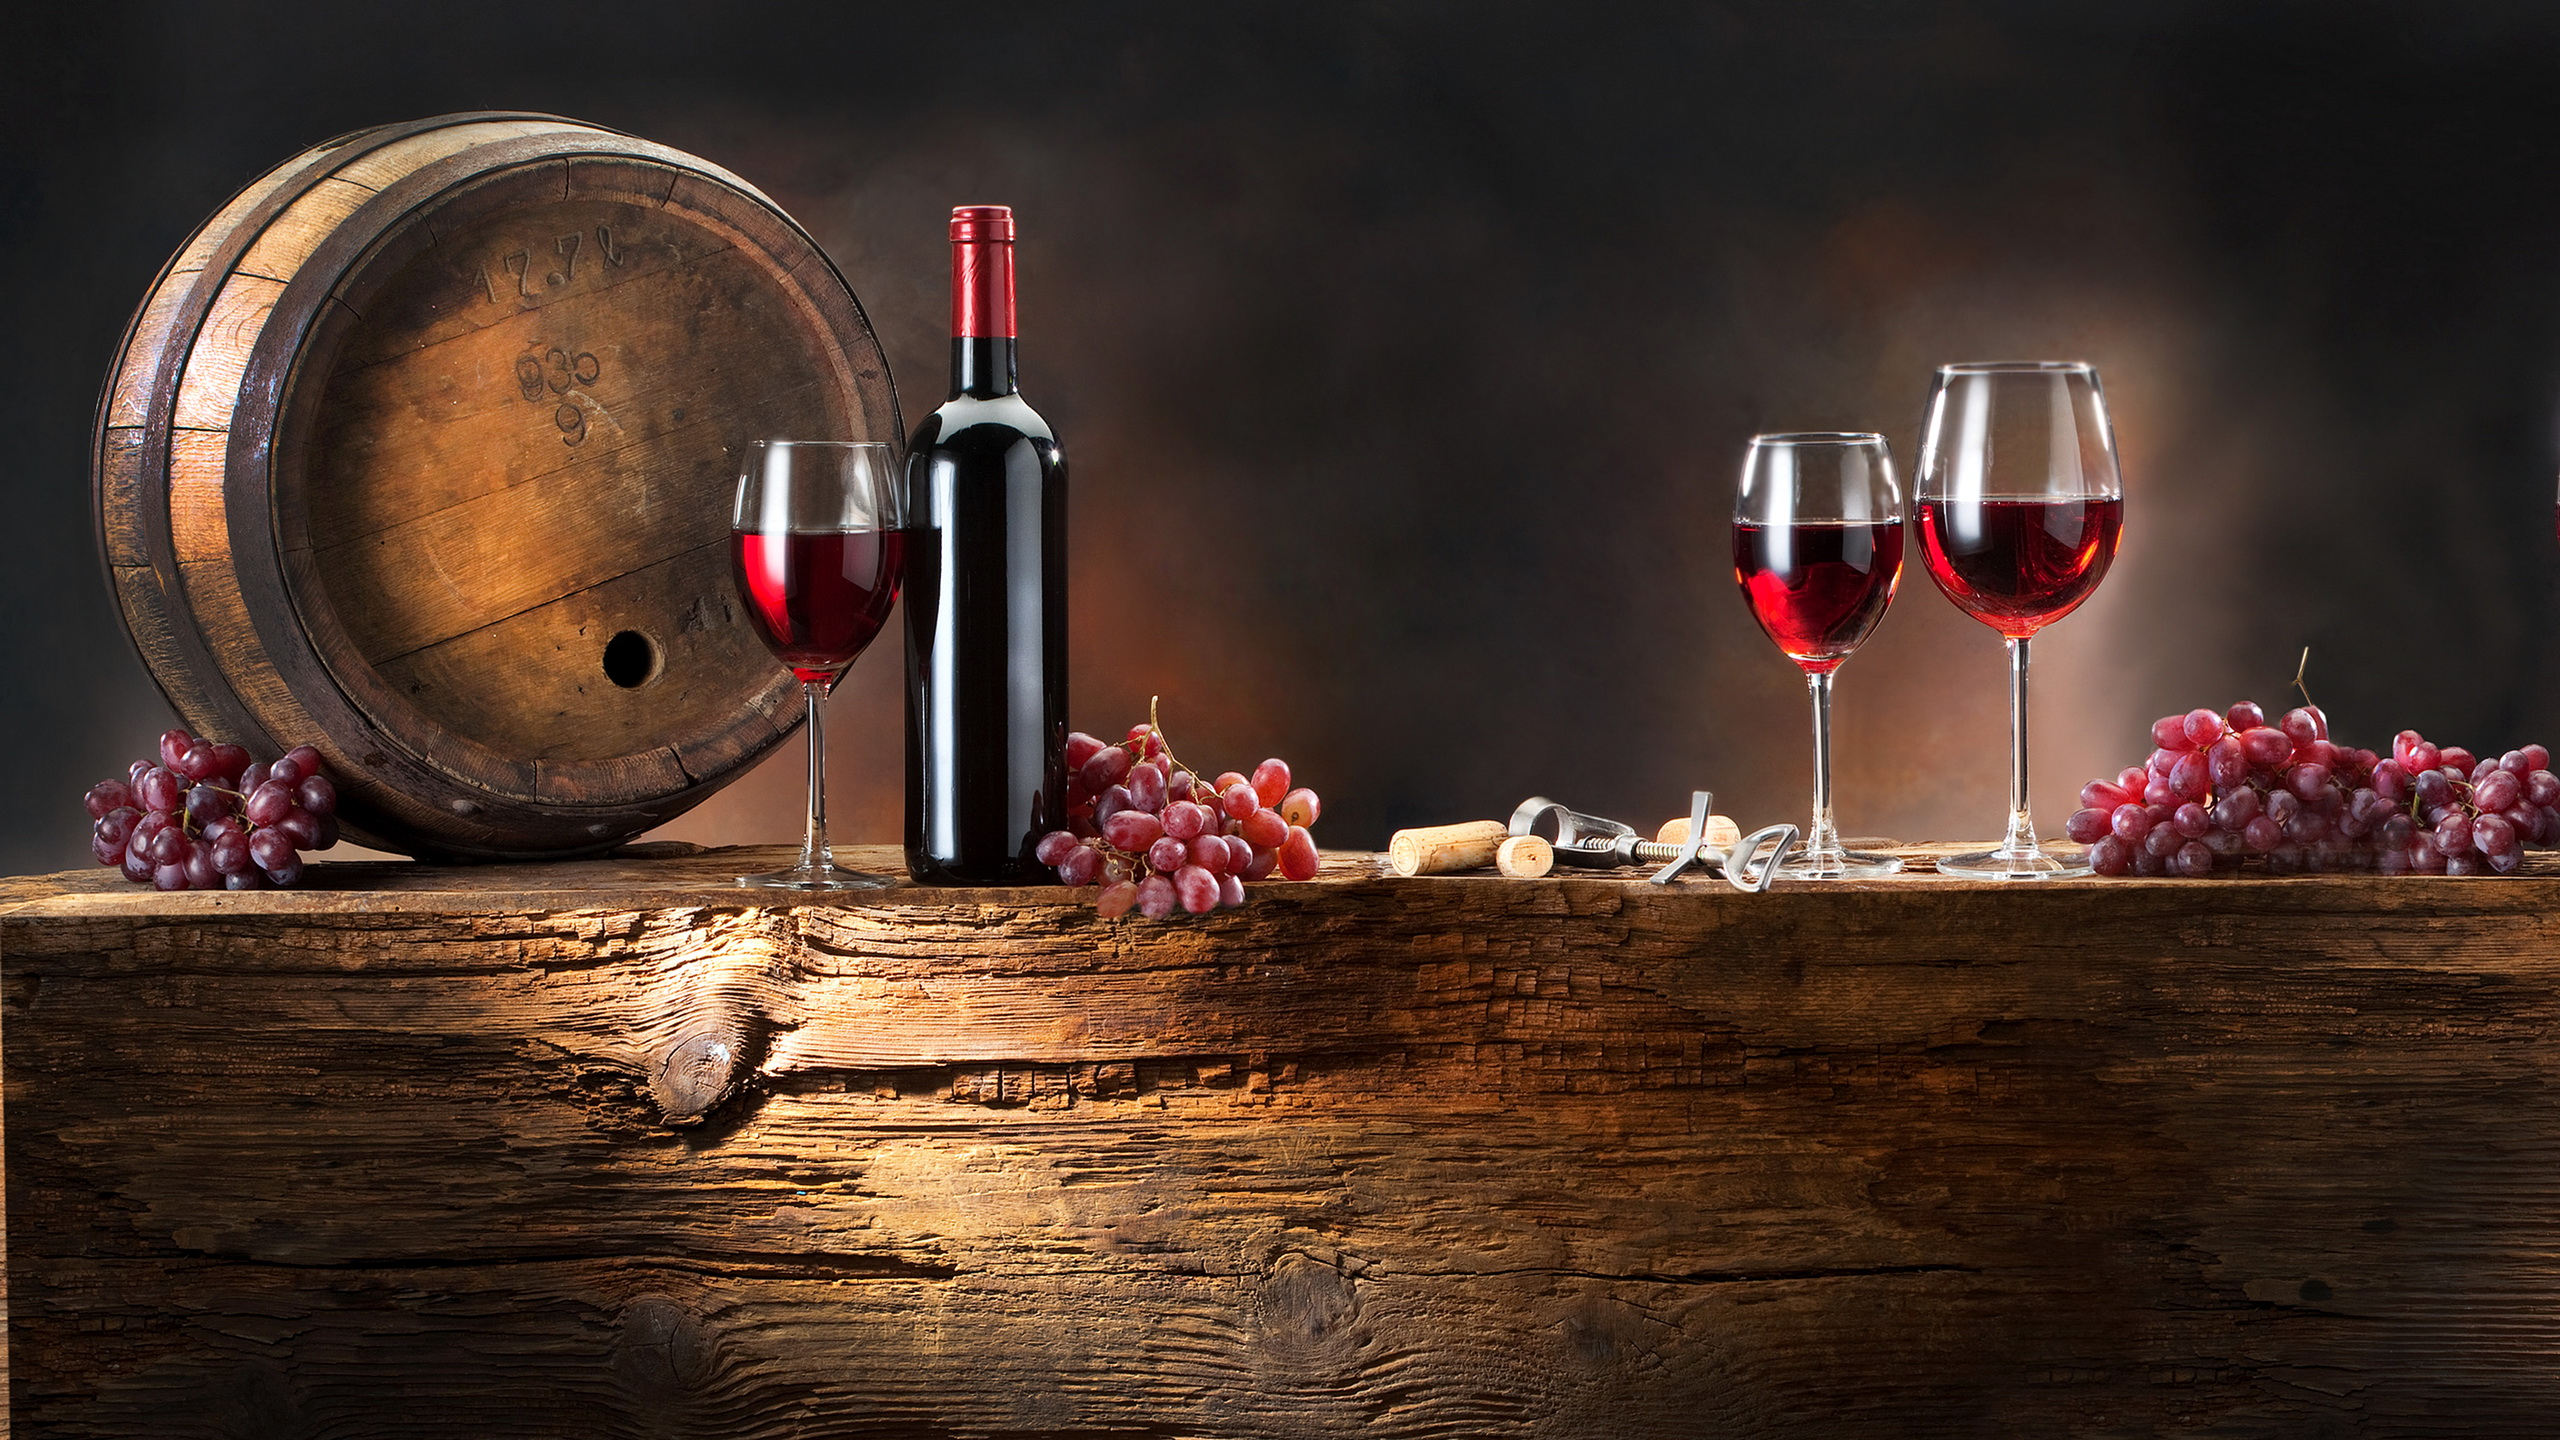 еда вино  № 598689 бесплатно